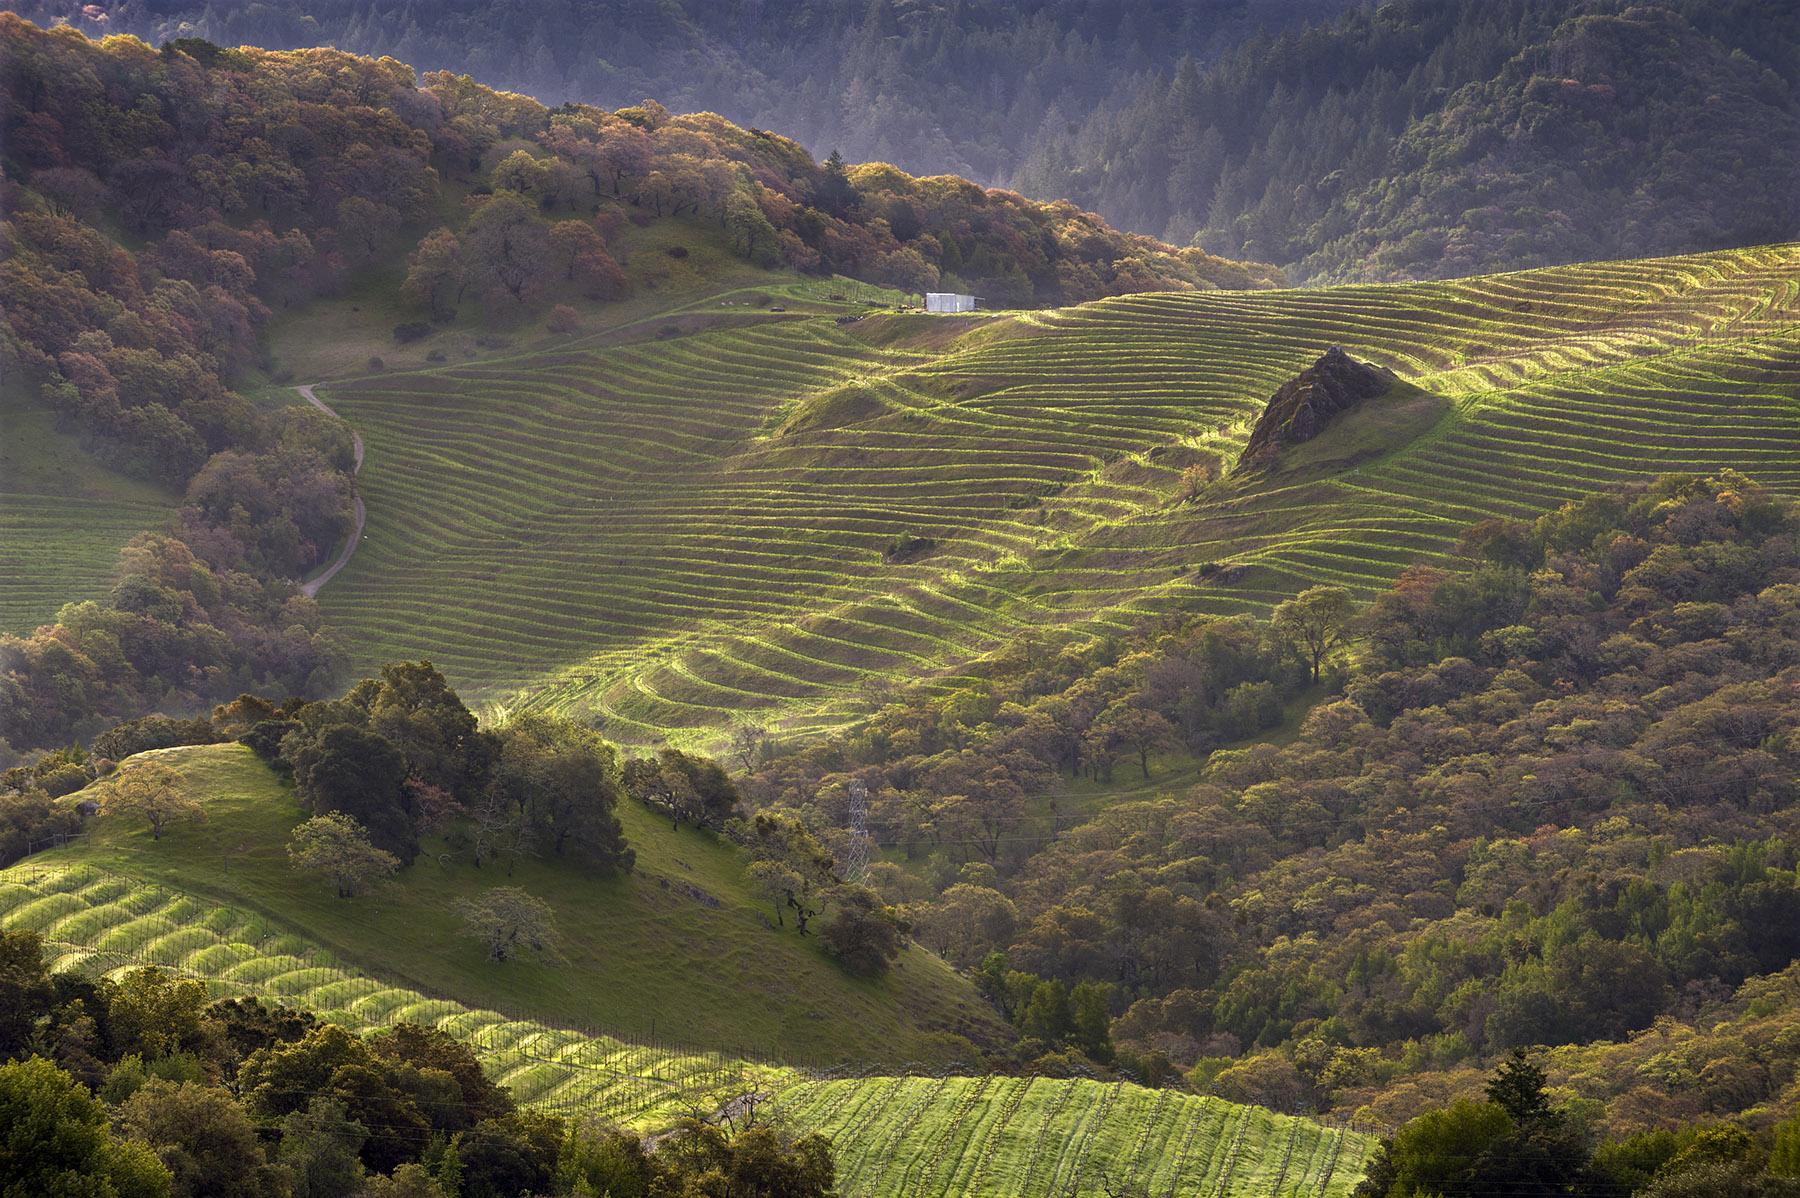 Field Study: Tasting the land at Cain Vineyard